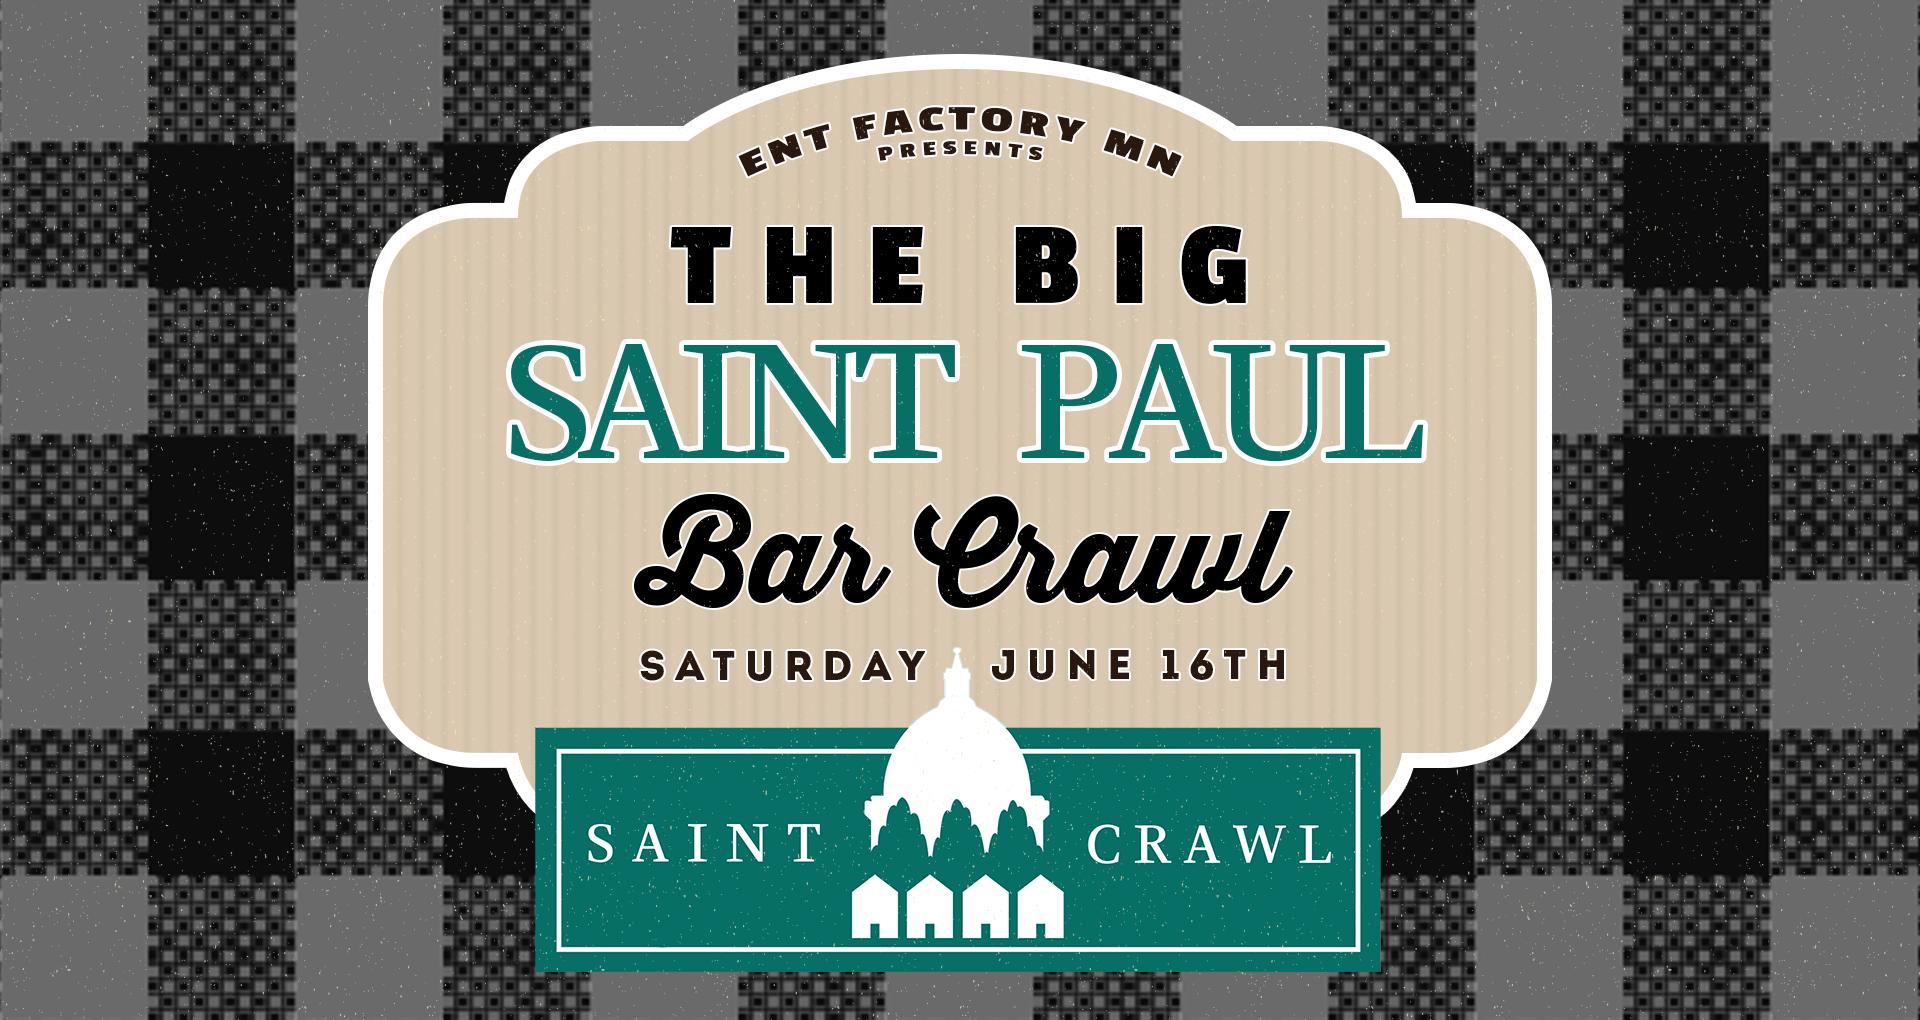 1920x1020-St Paul Crawl.png